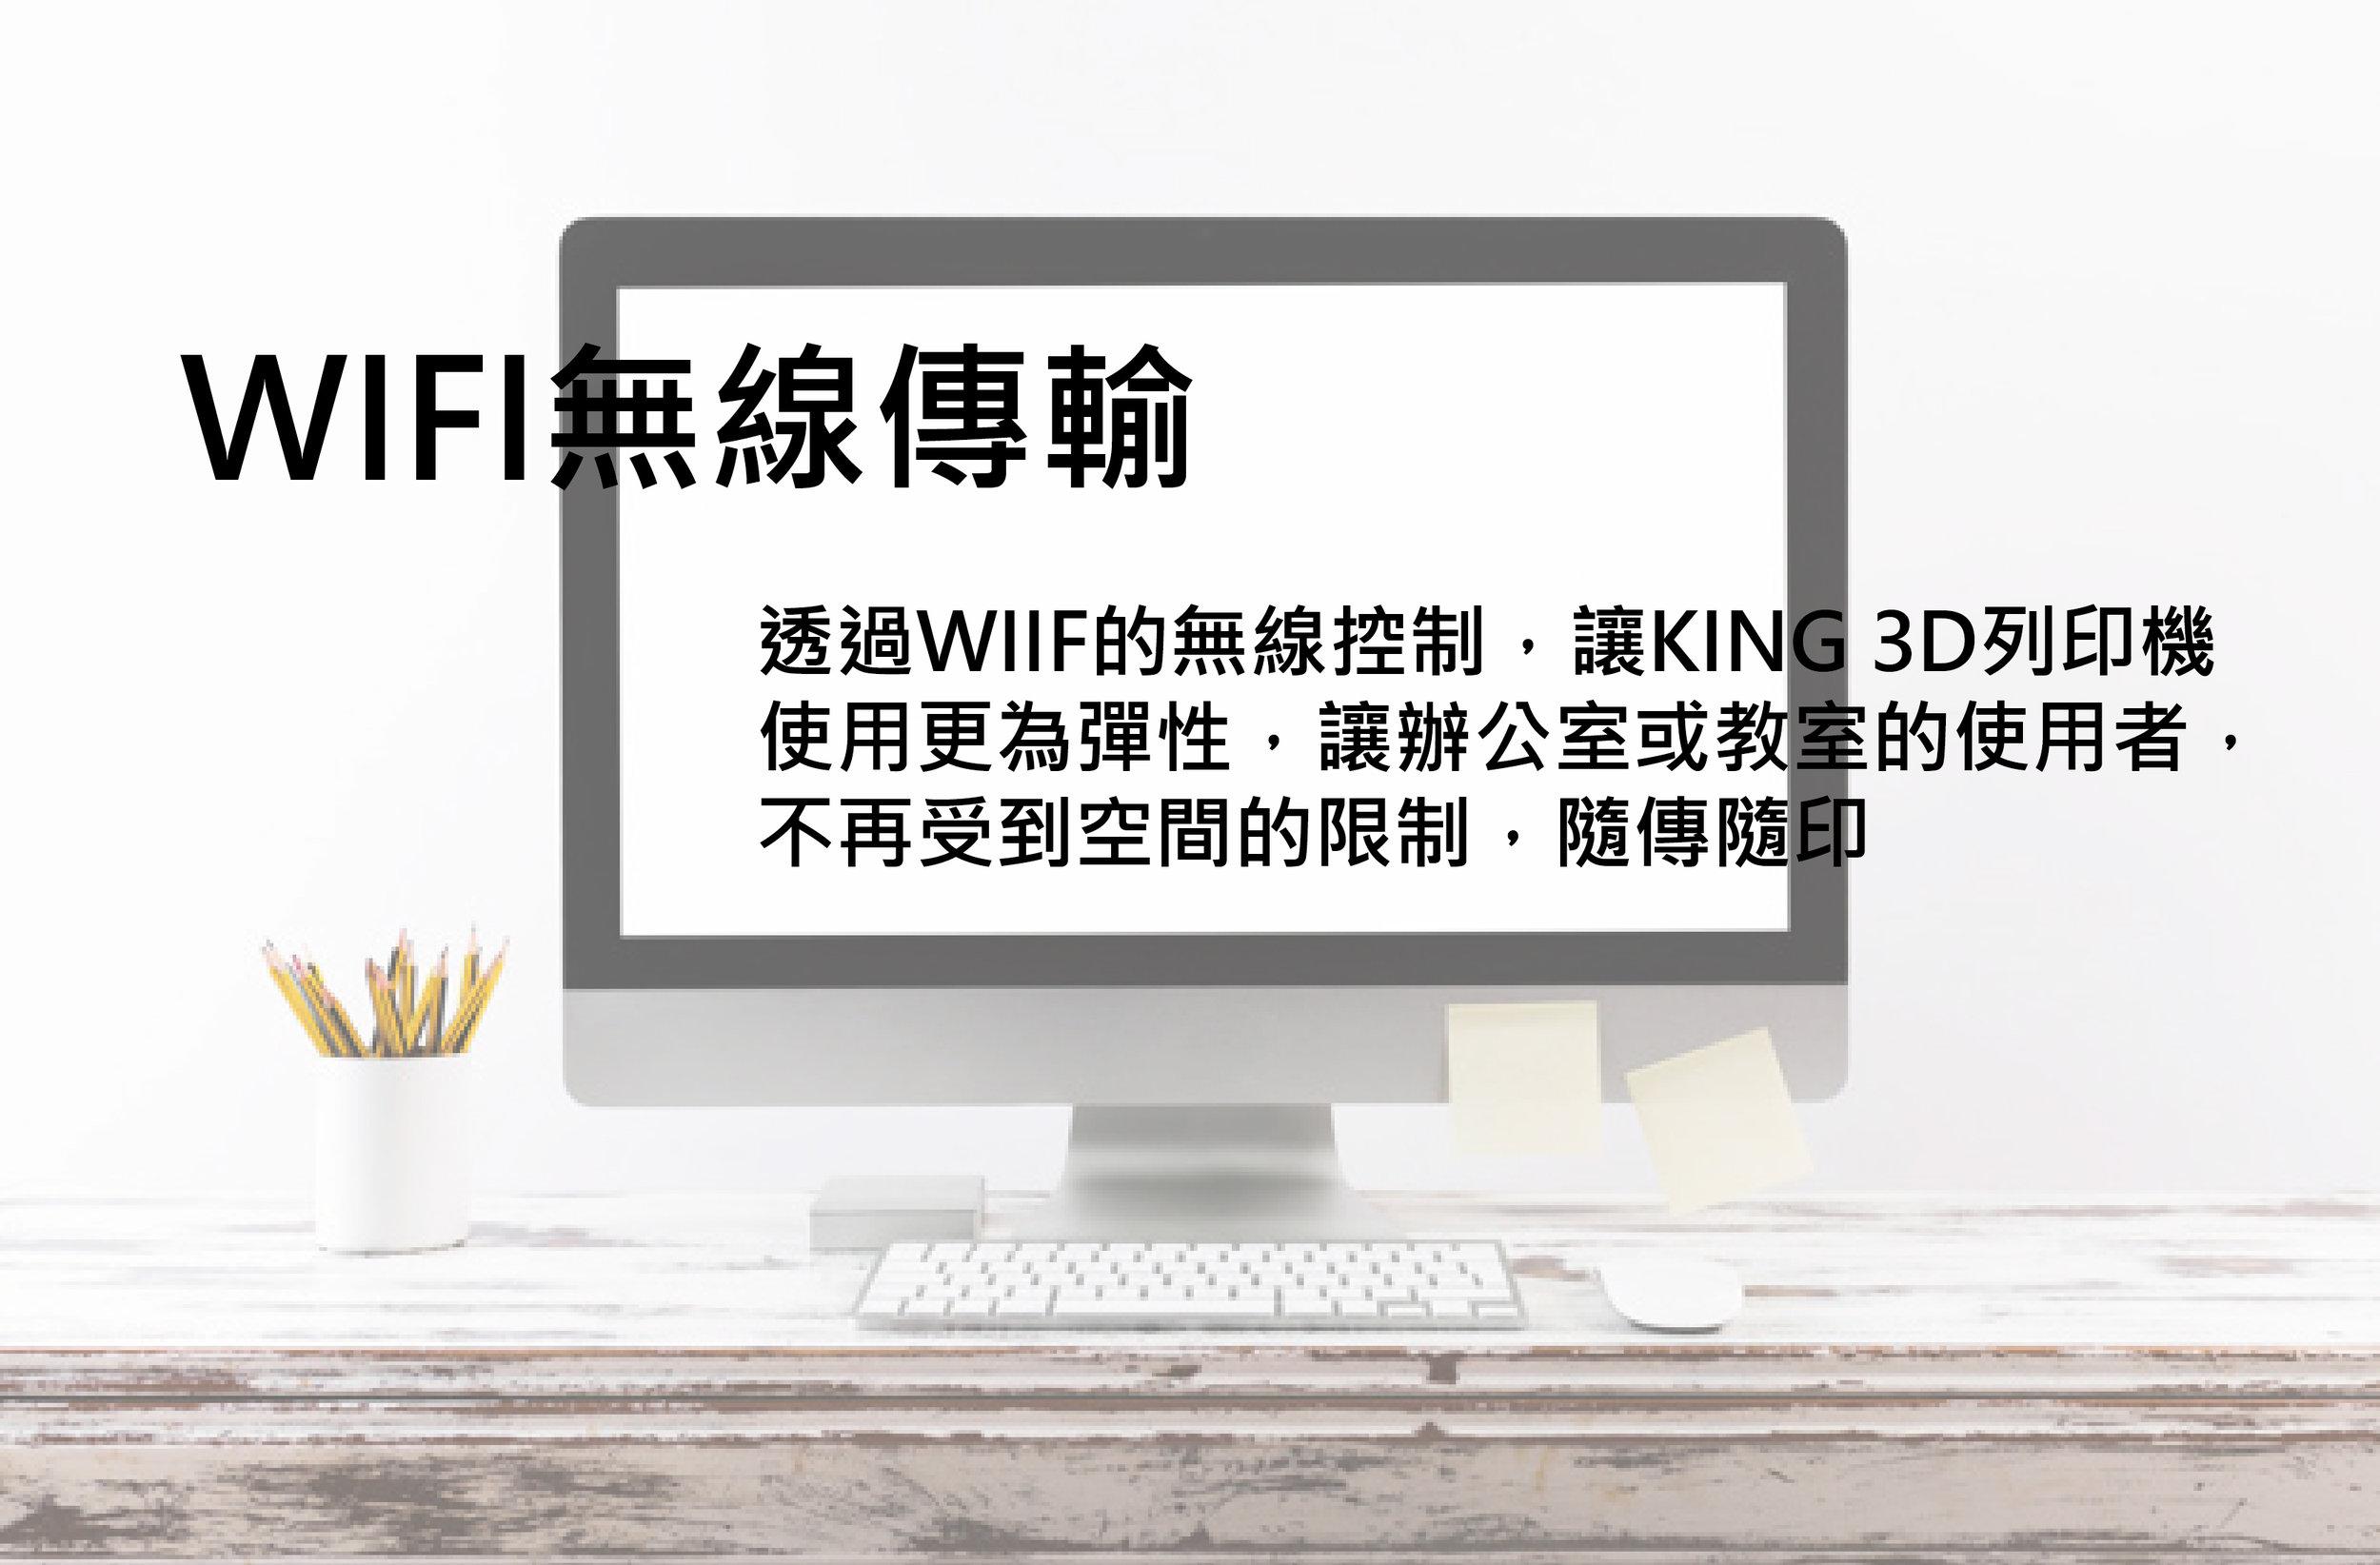 kingssel5050+wifi無限傳輸.jpg